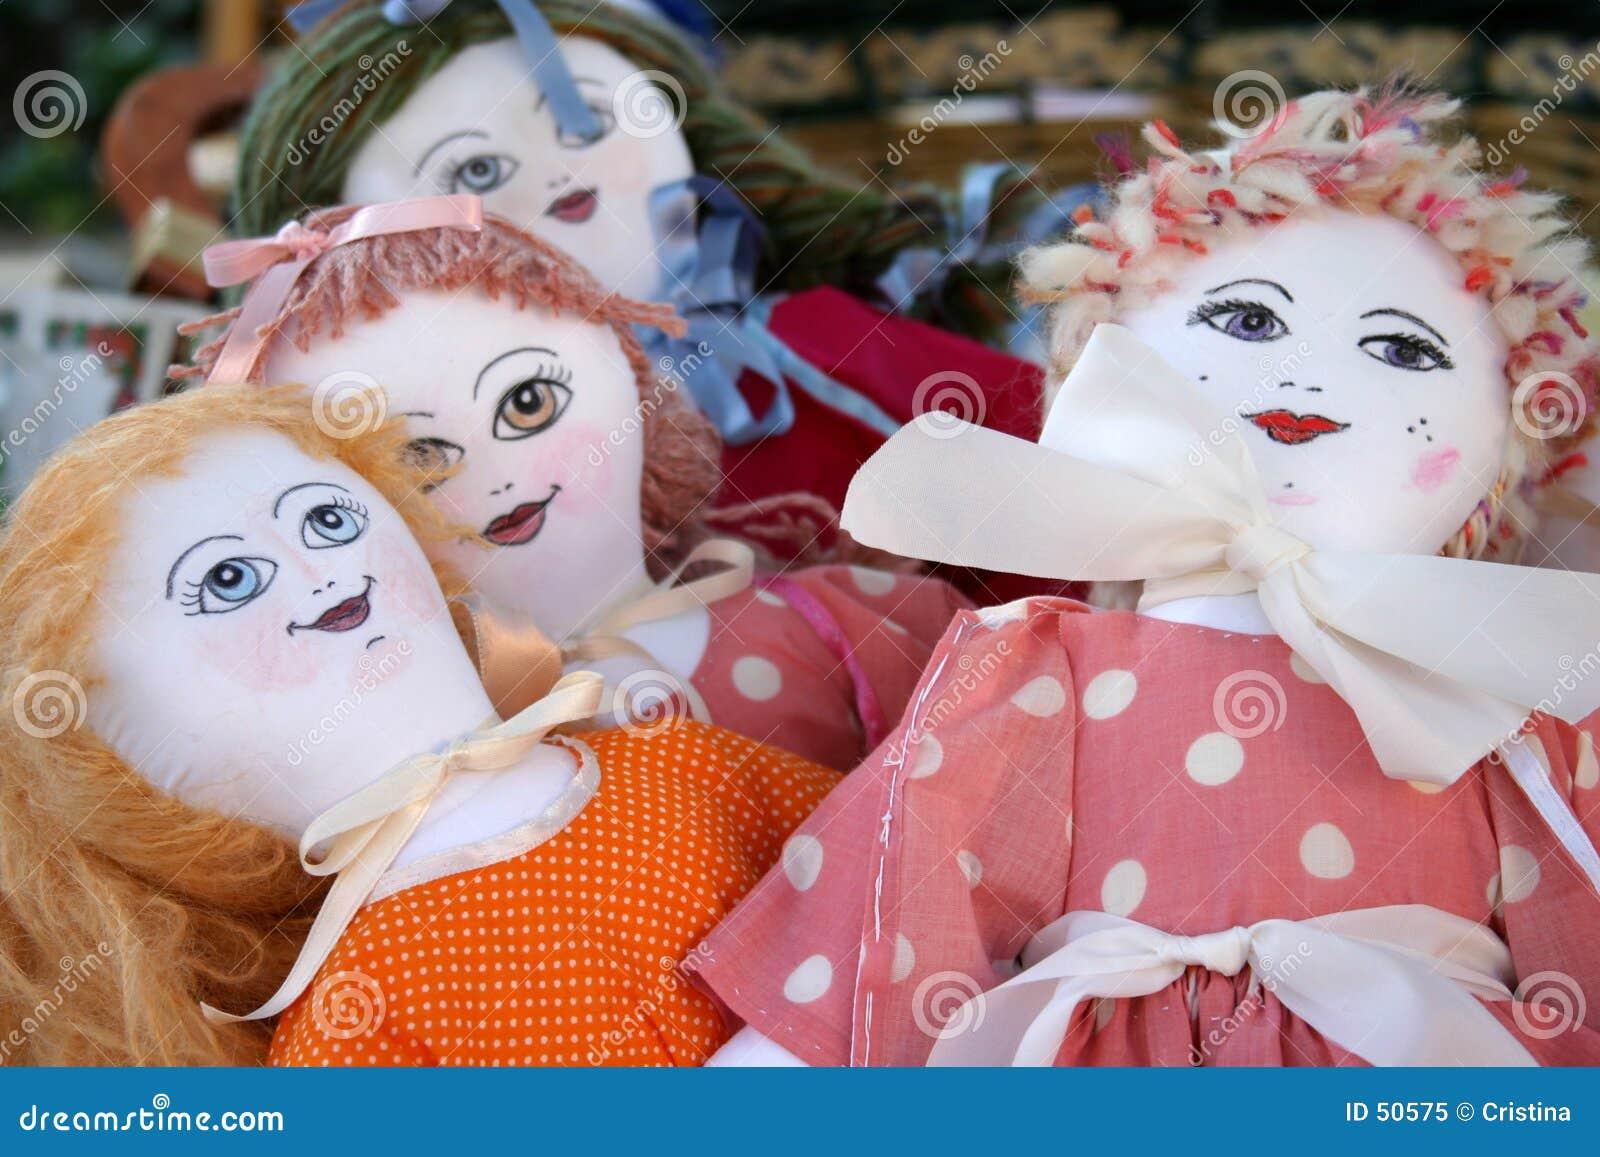 Ręczna robota lalki.